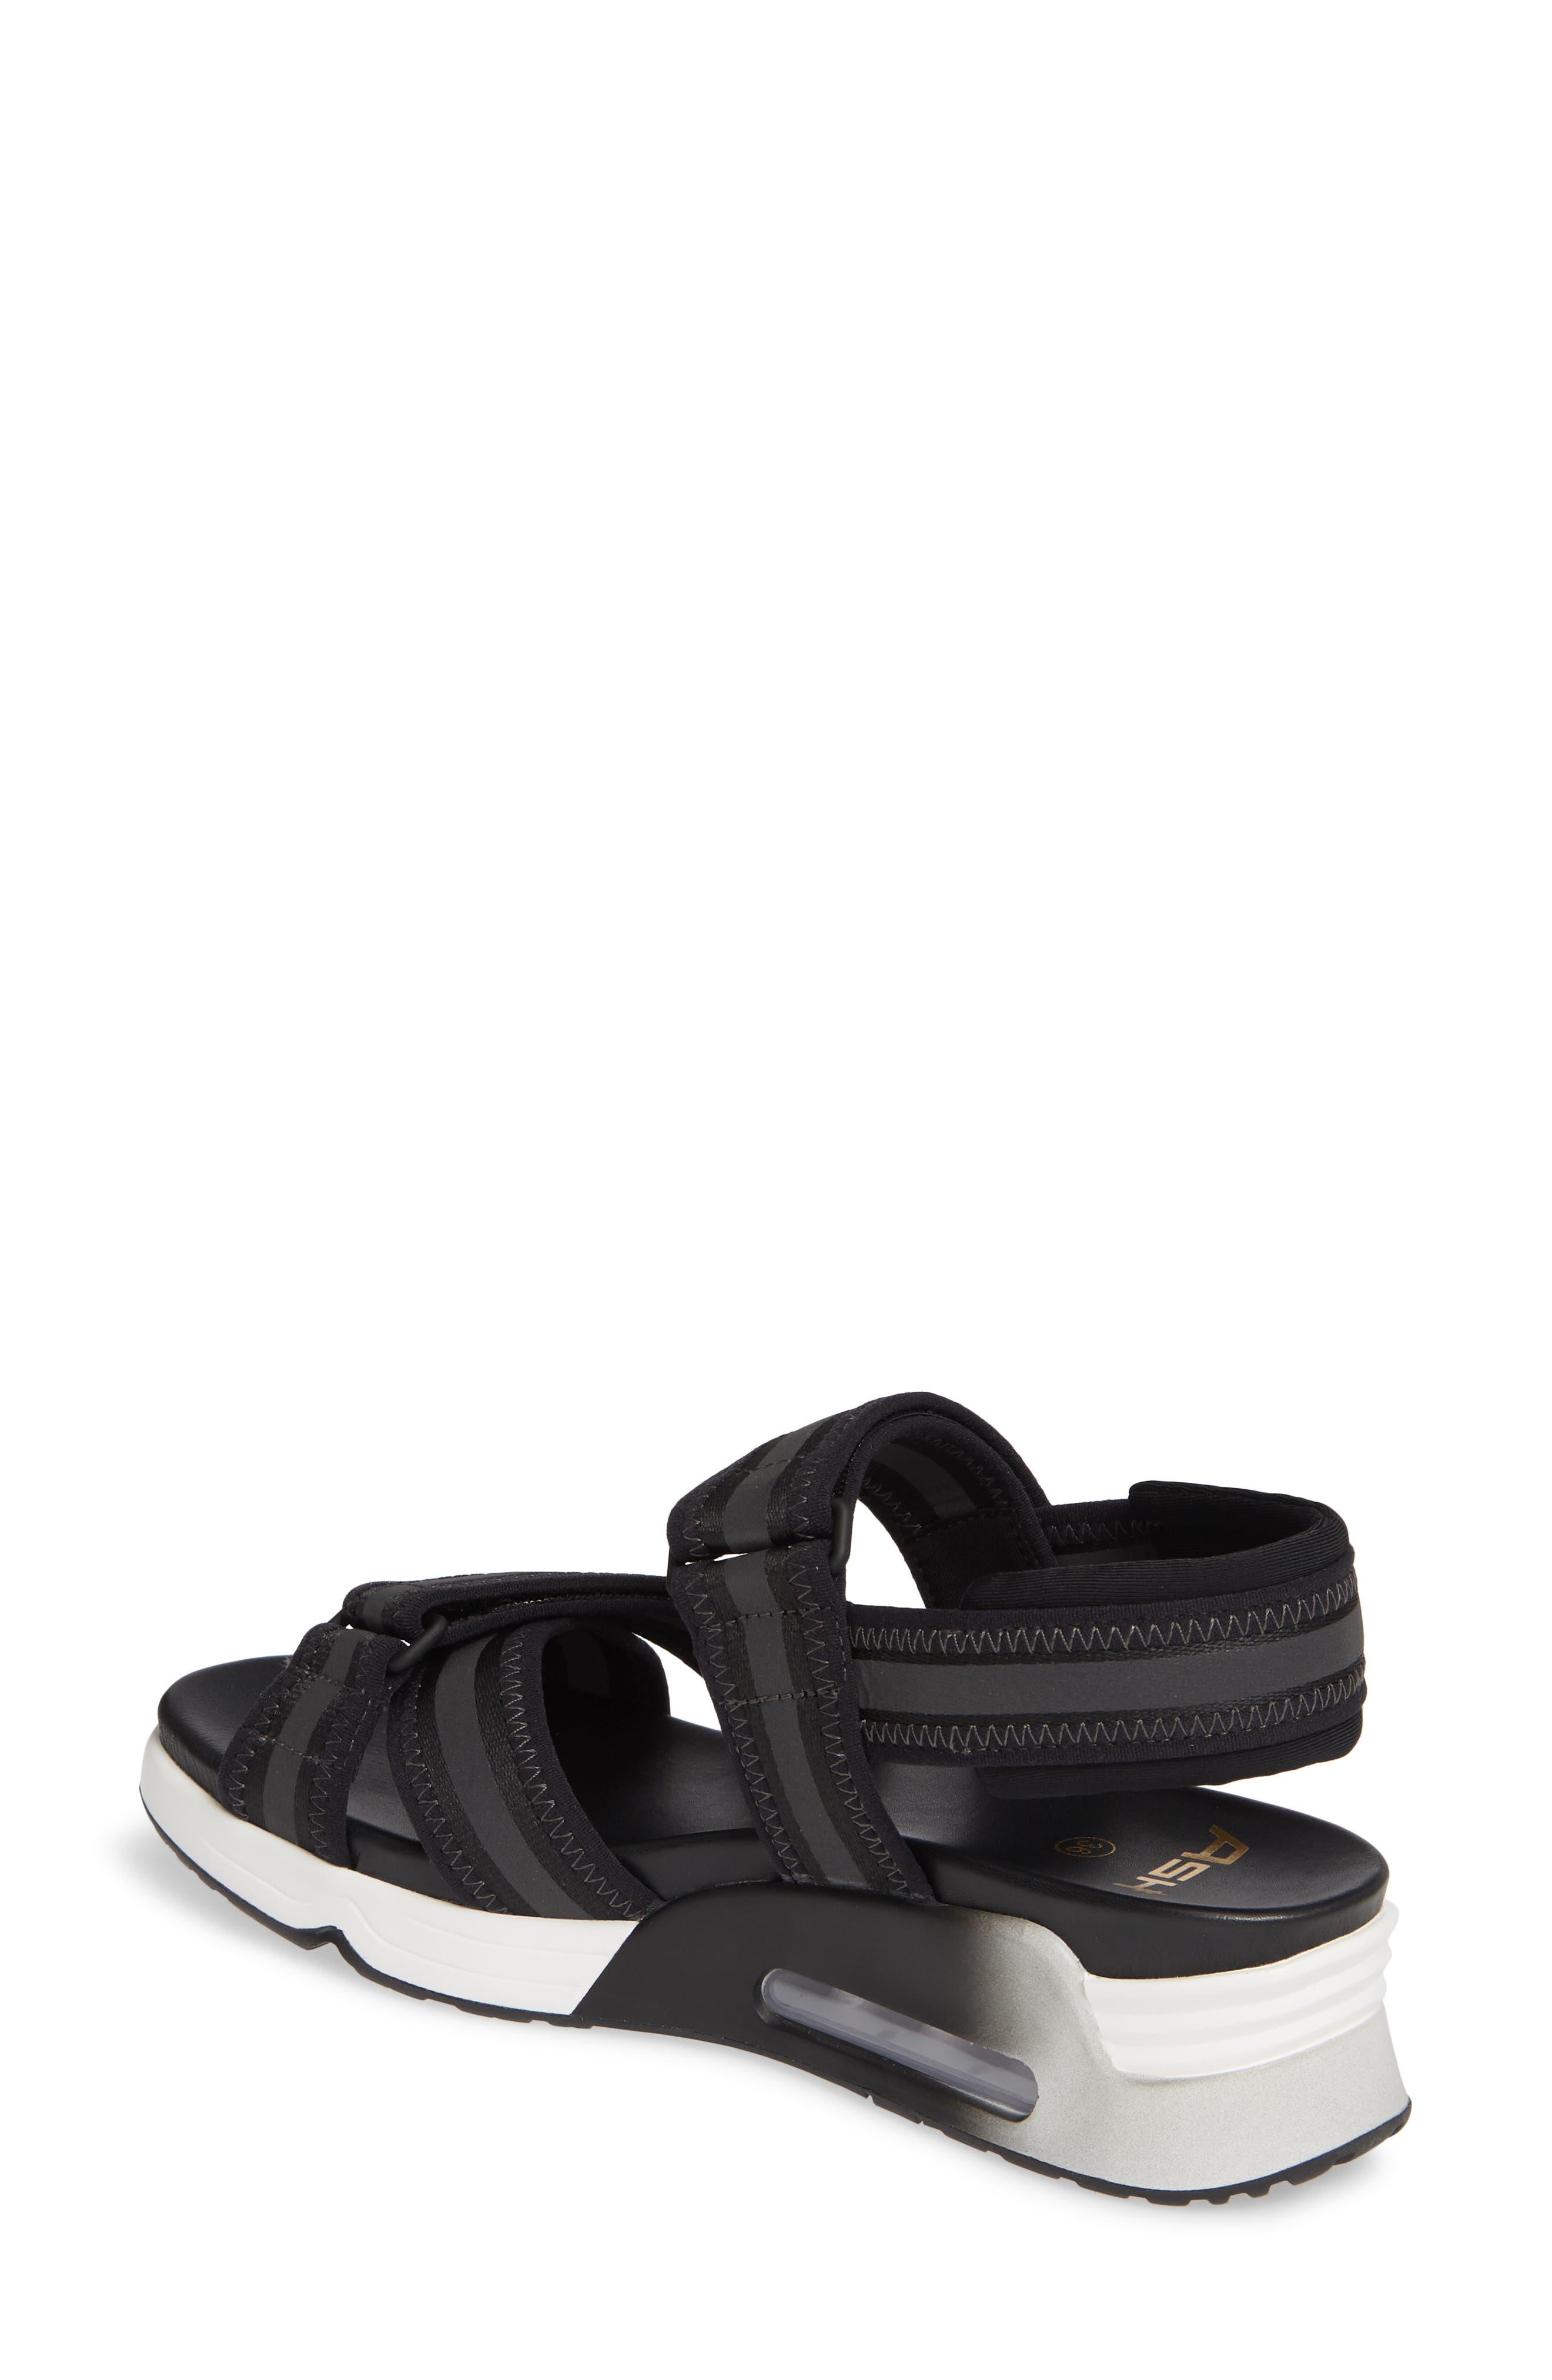 35f93dcd8867 Women s Ash Sandals